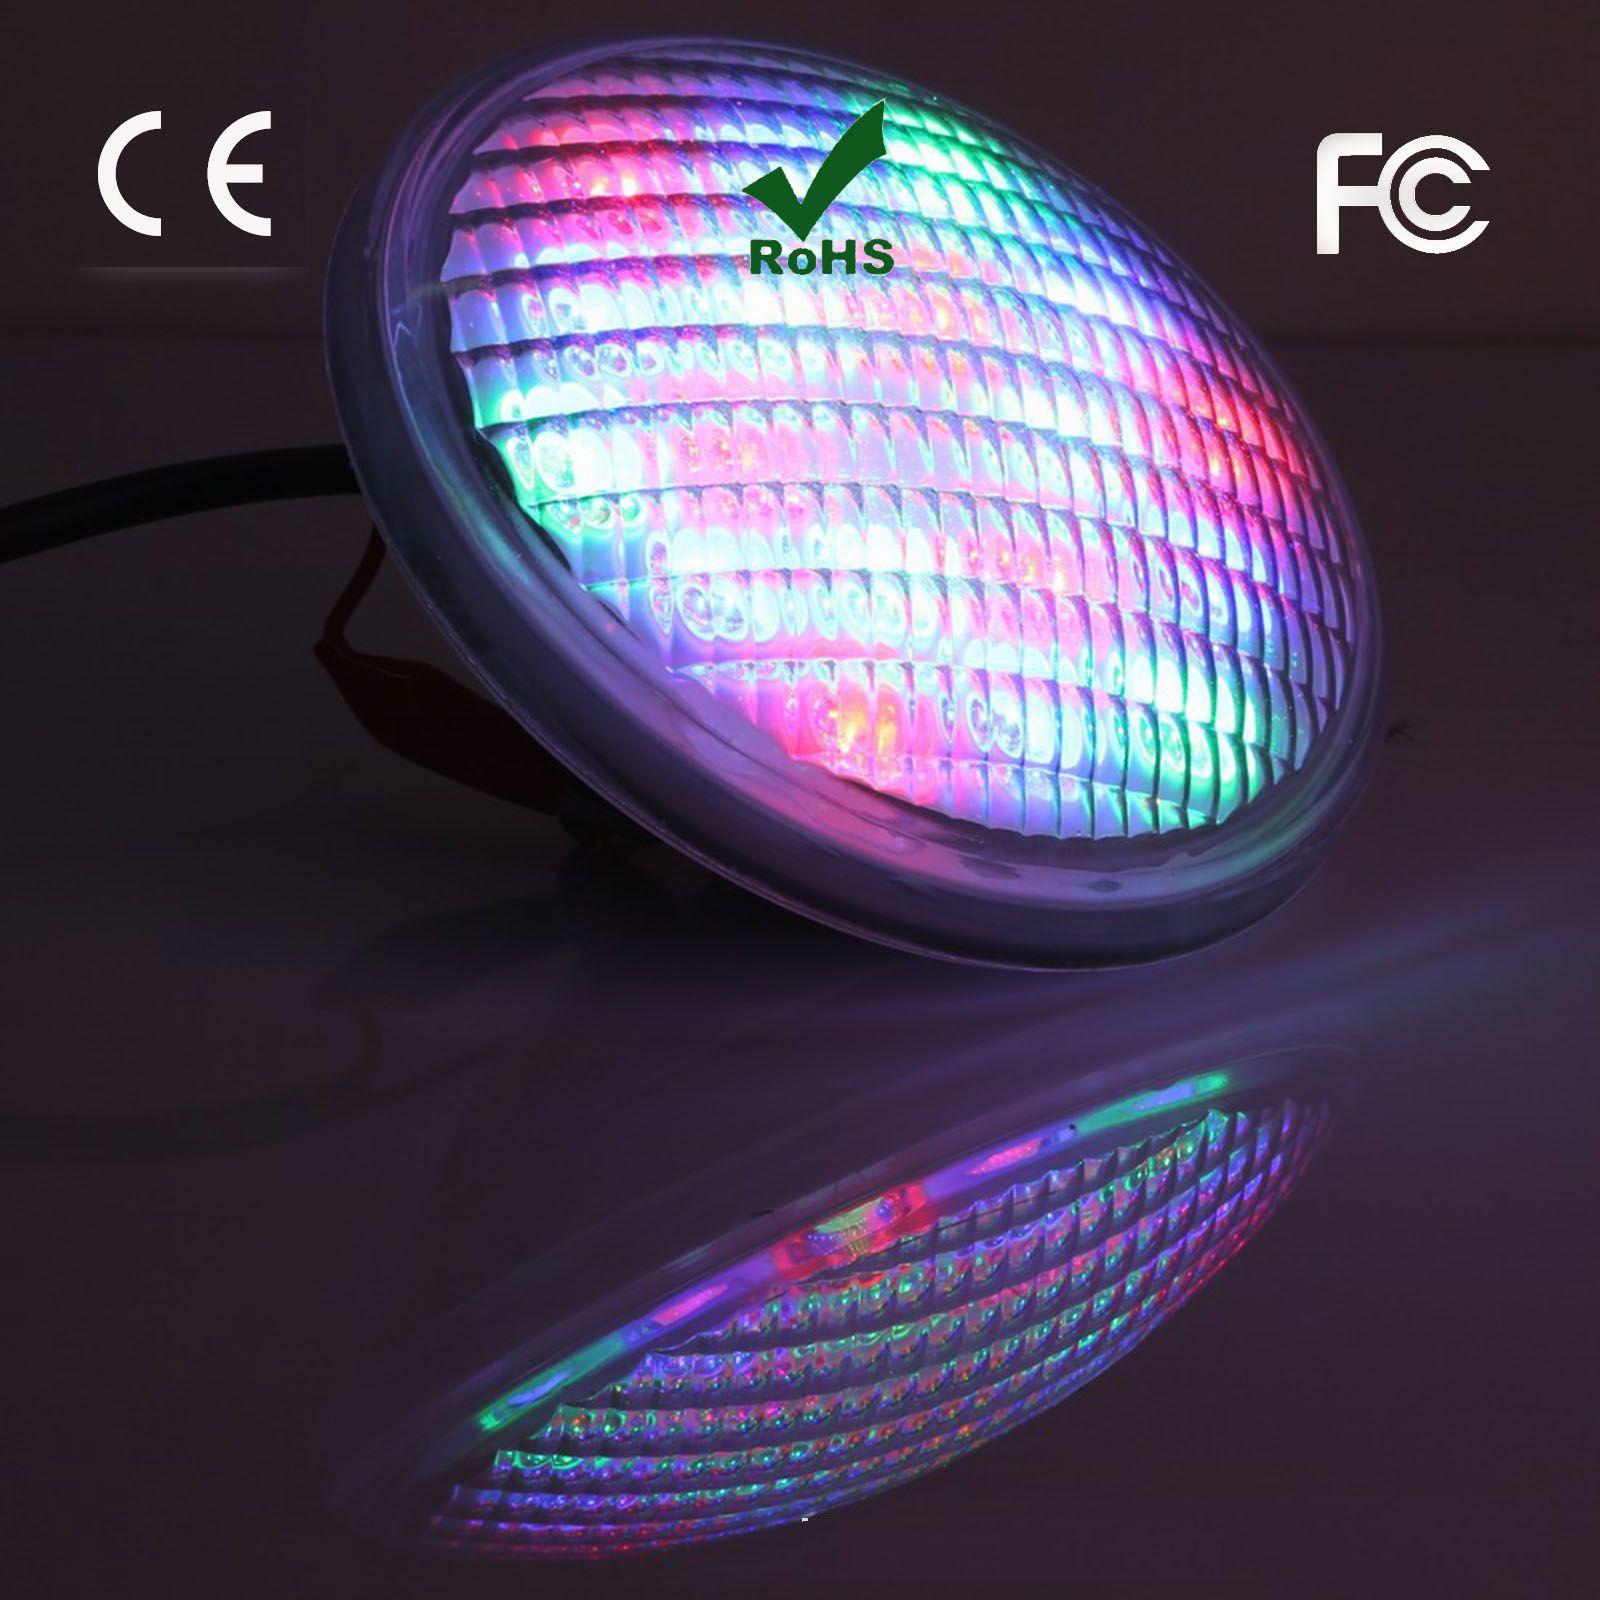 Luce di alta potenza 54W LED acciaio inossidabile 304 LED Luce per piscina LED luce subacquea IP 68 PAR56 12V RGB proiettore